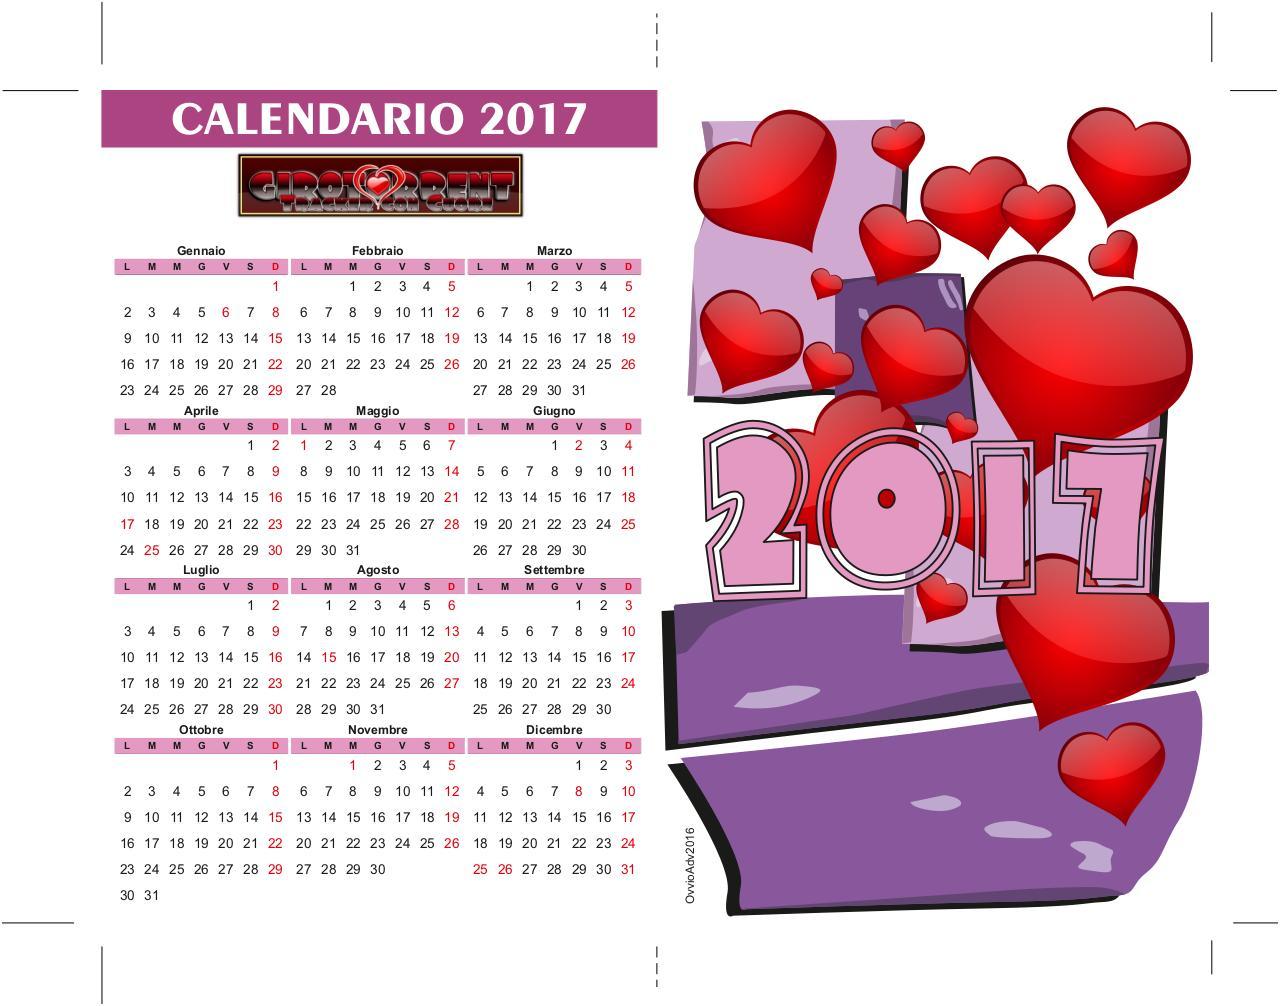 Mini Calendario.Mini Calendario 2017 Cdr By Sinapsi Mini Calendario Tavolo